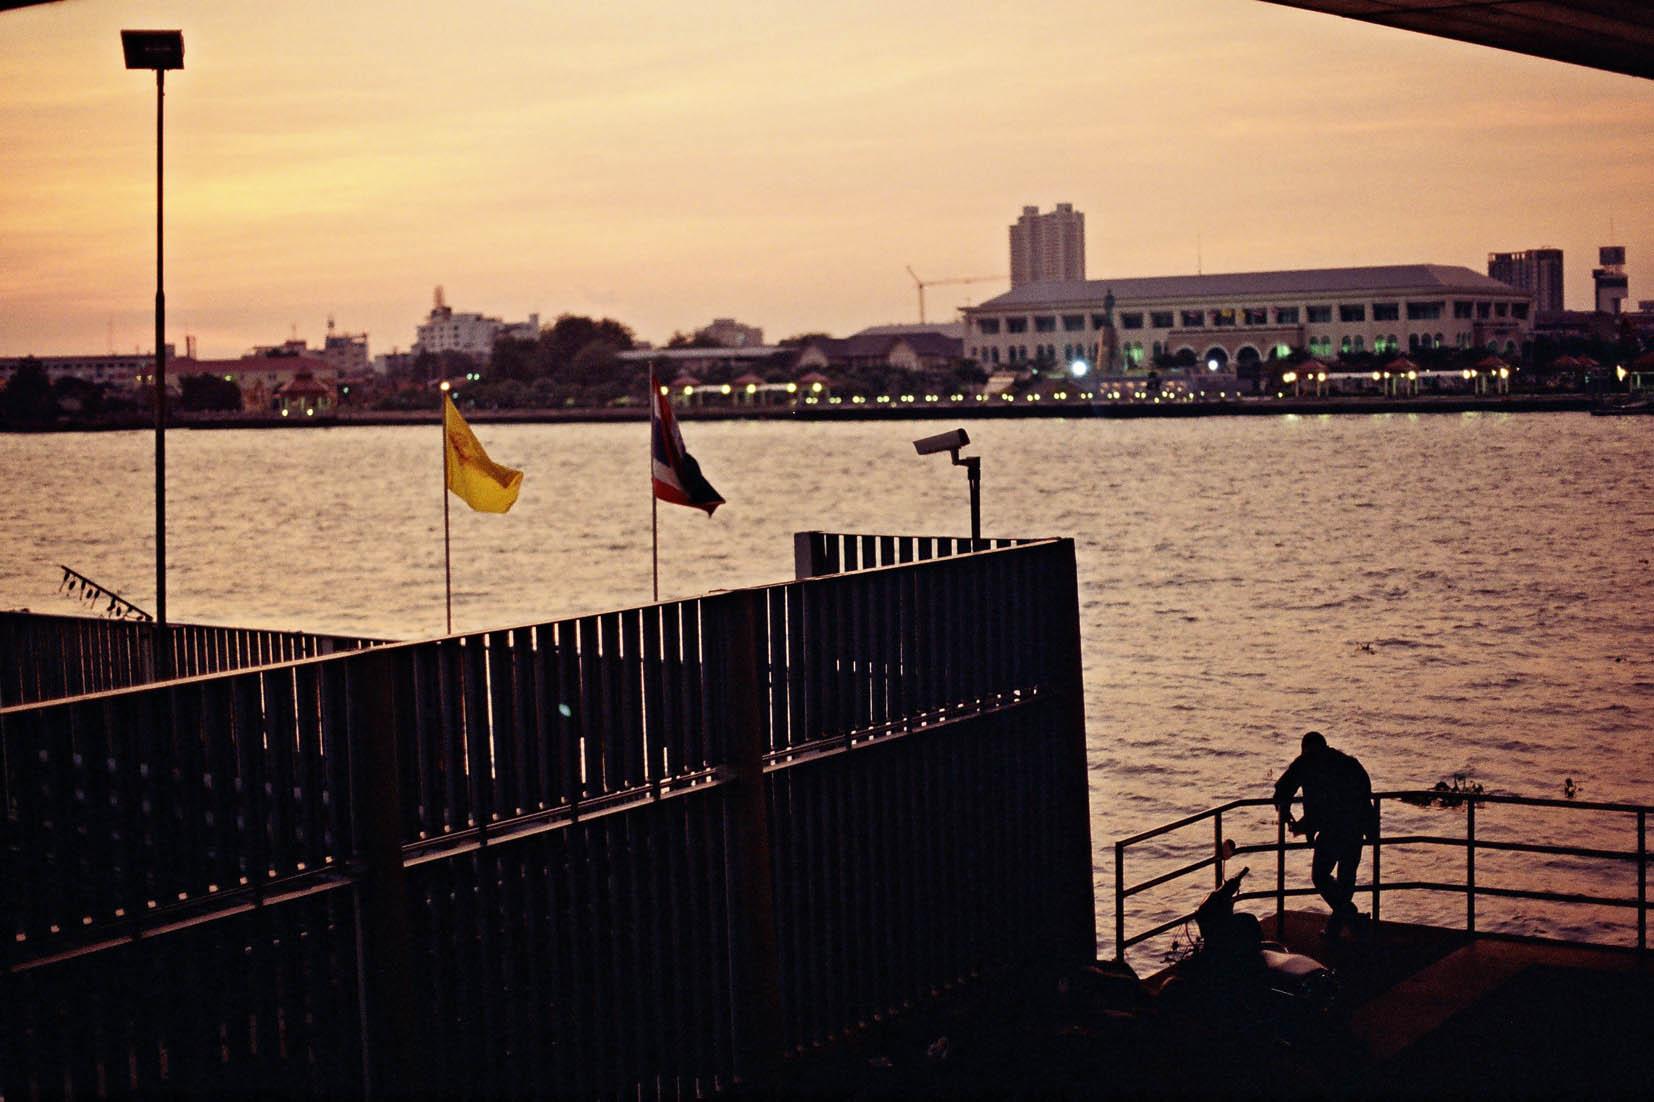 Shot on a Minolta X-300. Bangkok, 2012.